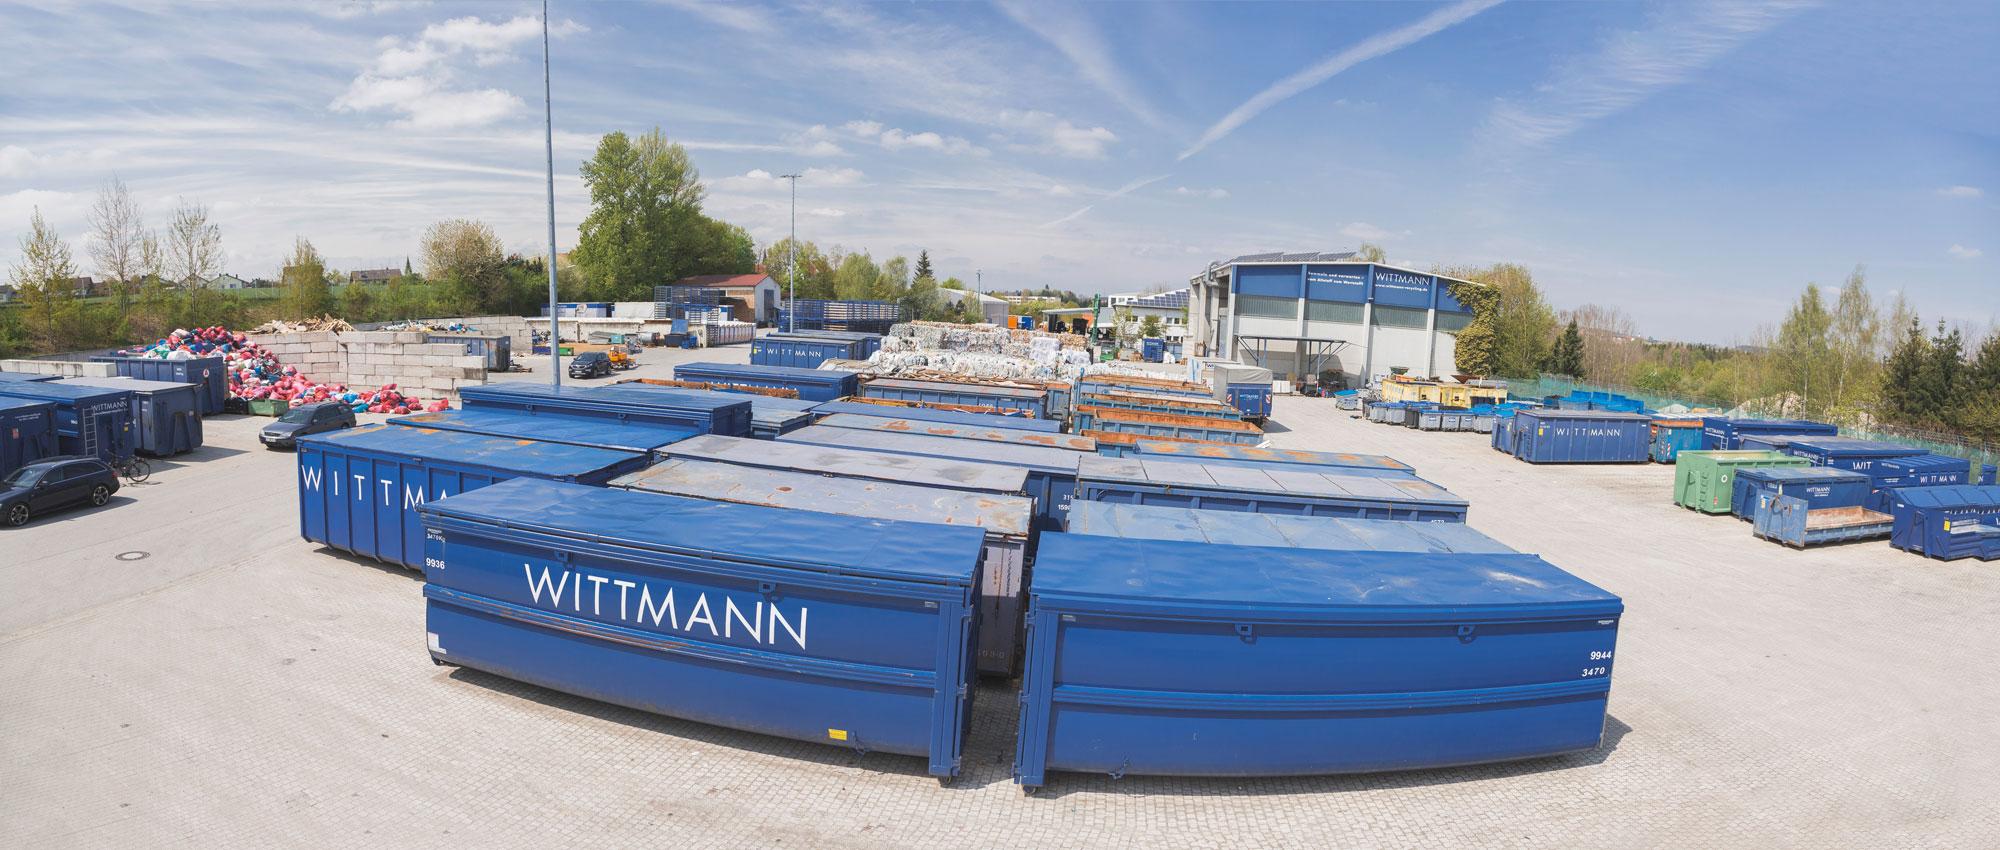 Das Wittmann Recycling Gelände